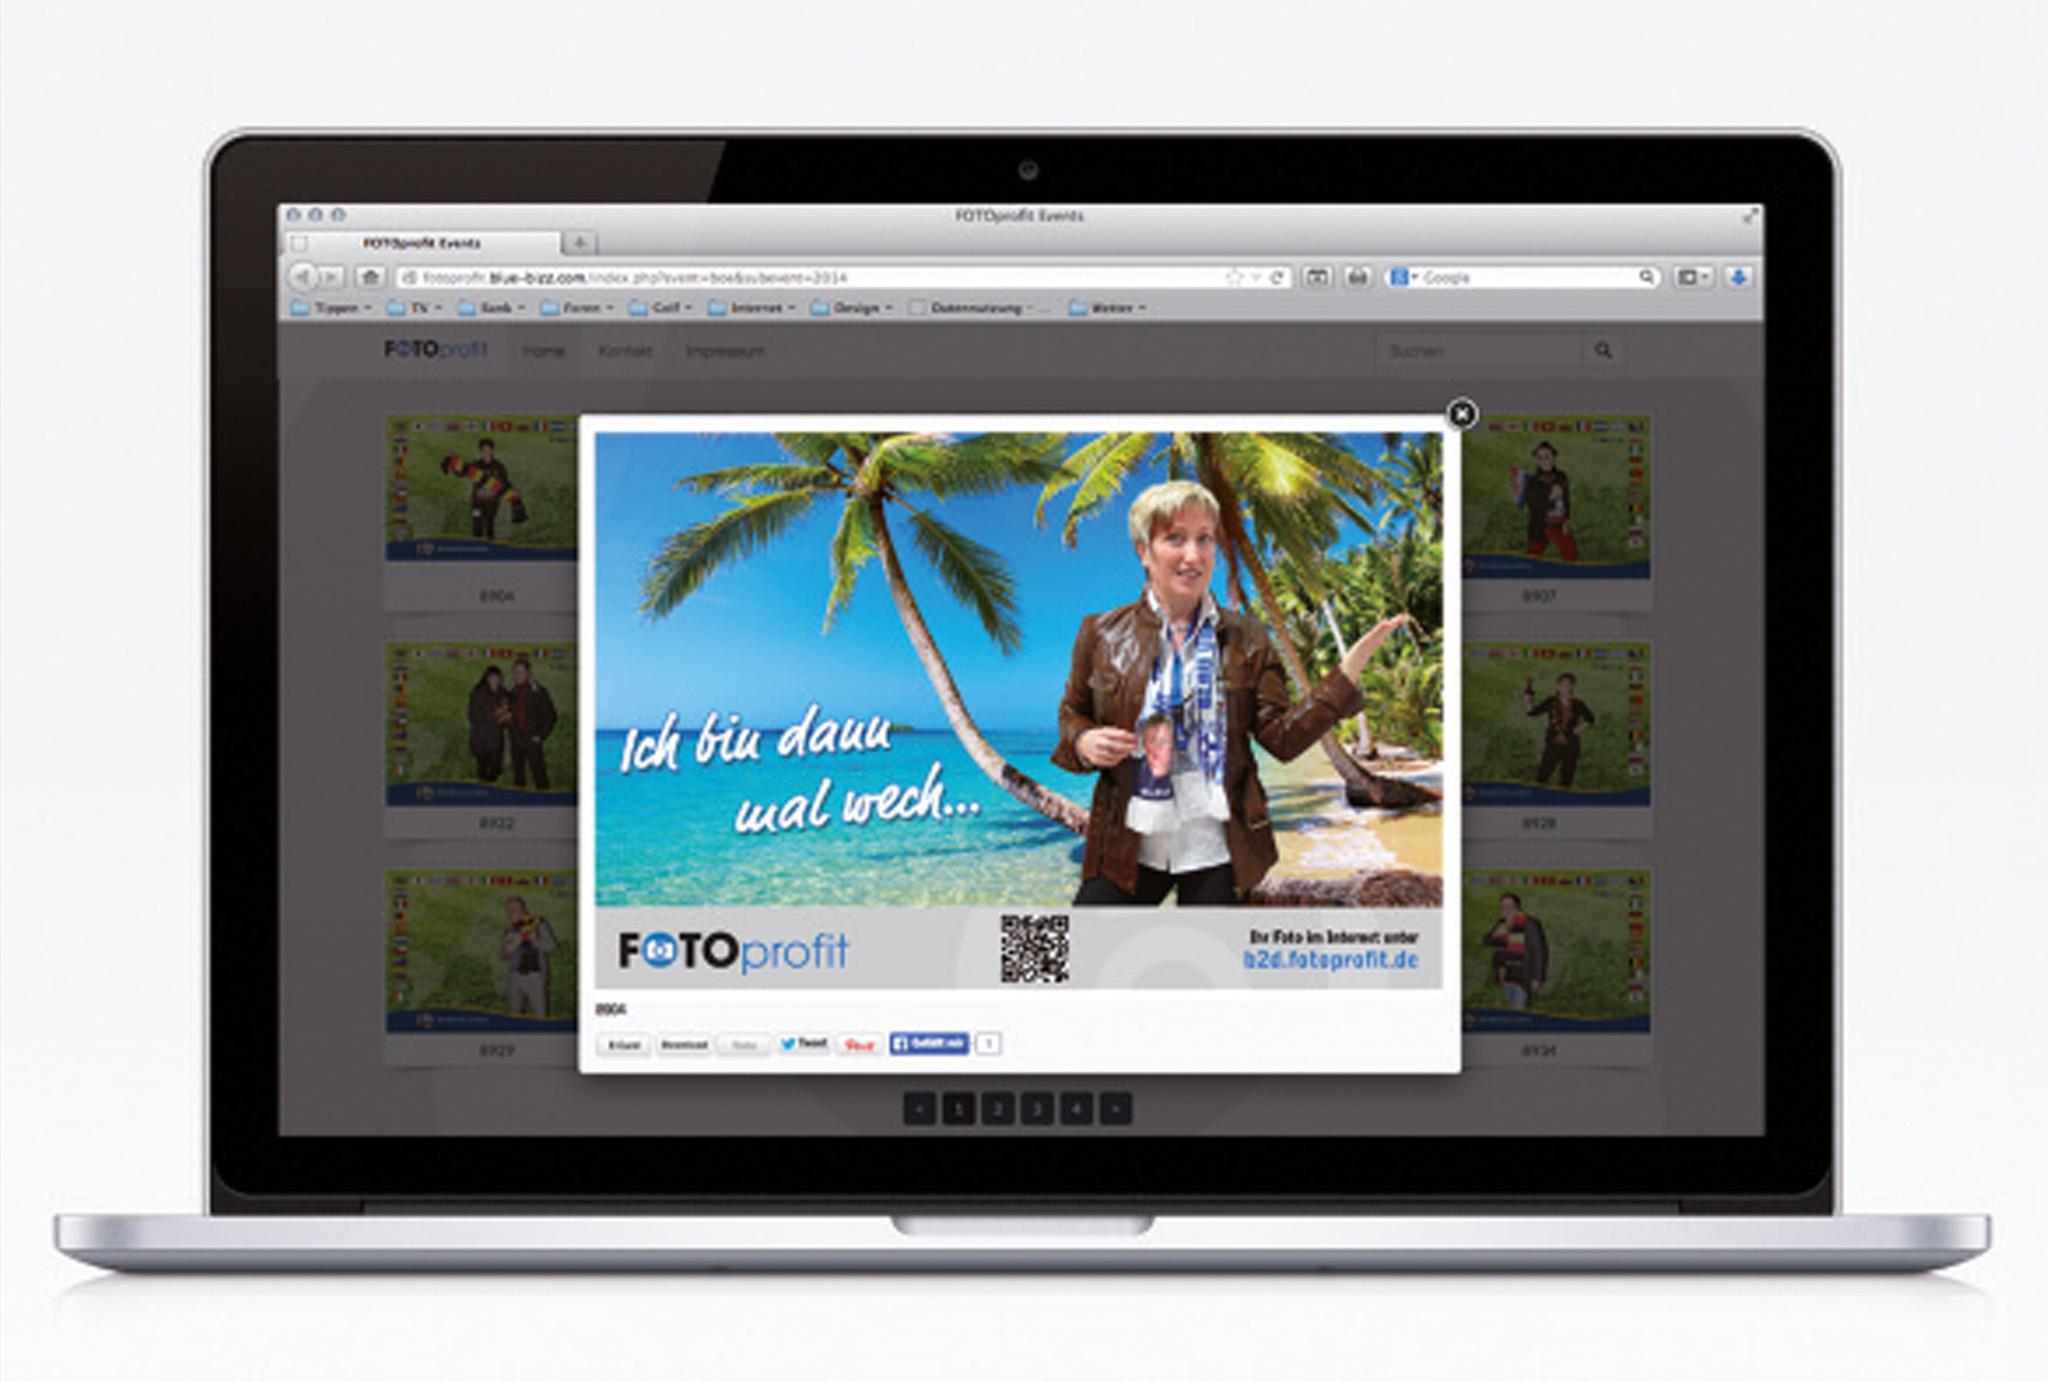 http://new-it-generation.de/wp-content/uploads/2016/07/dein-profit-Webalbum.jpg